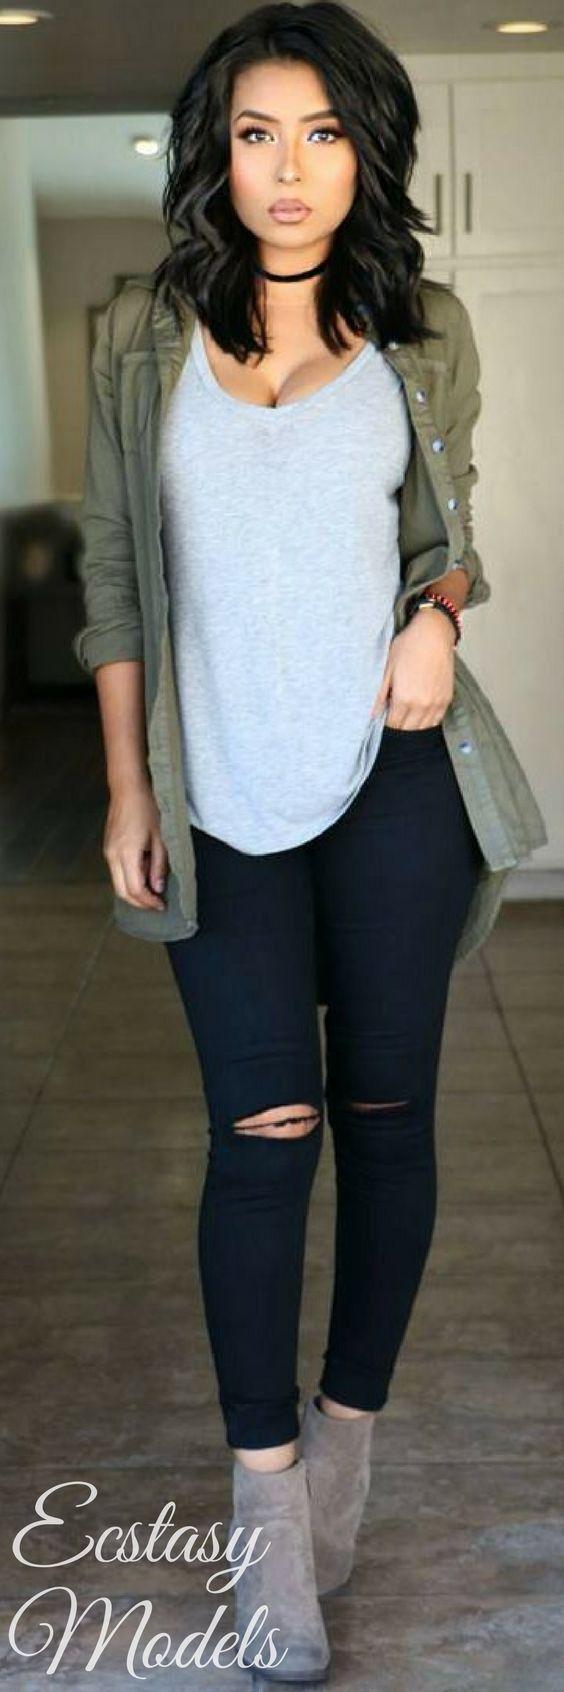 Casual bootie life Green top @gia_monae , Tee @kjcouture code itsmsmonica Jeans @fashionnova code xomonicas , Booties (Roberta booties)@shoppriceless Fashion